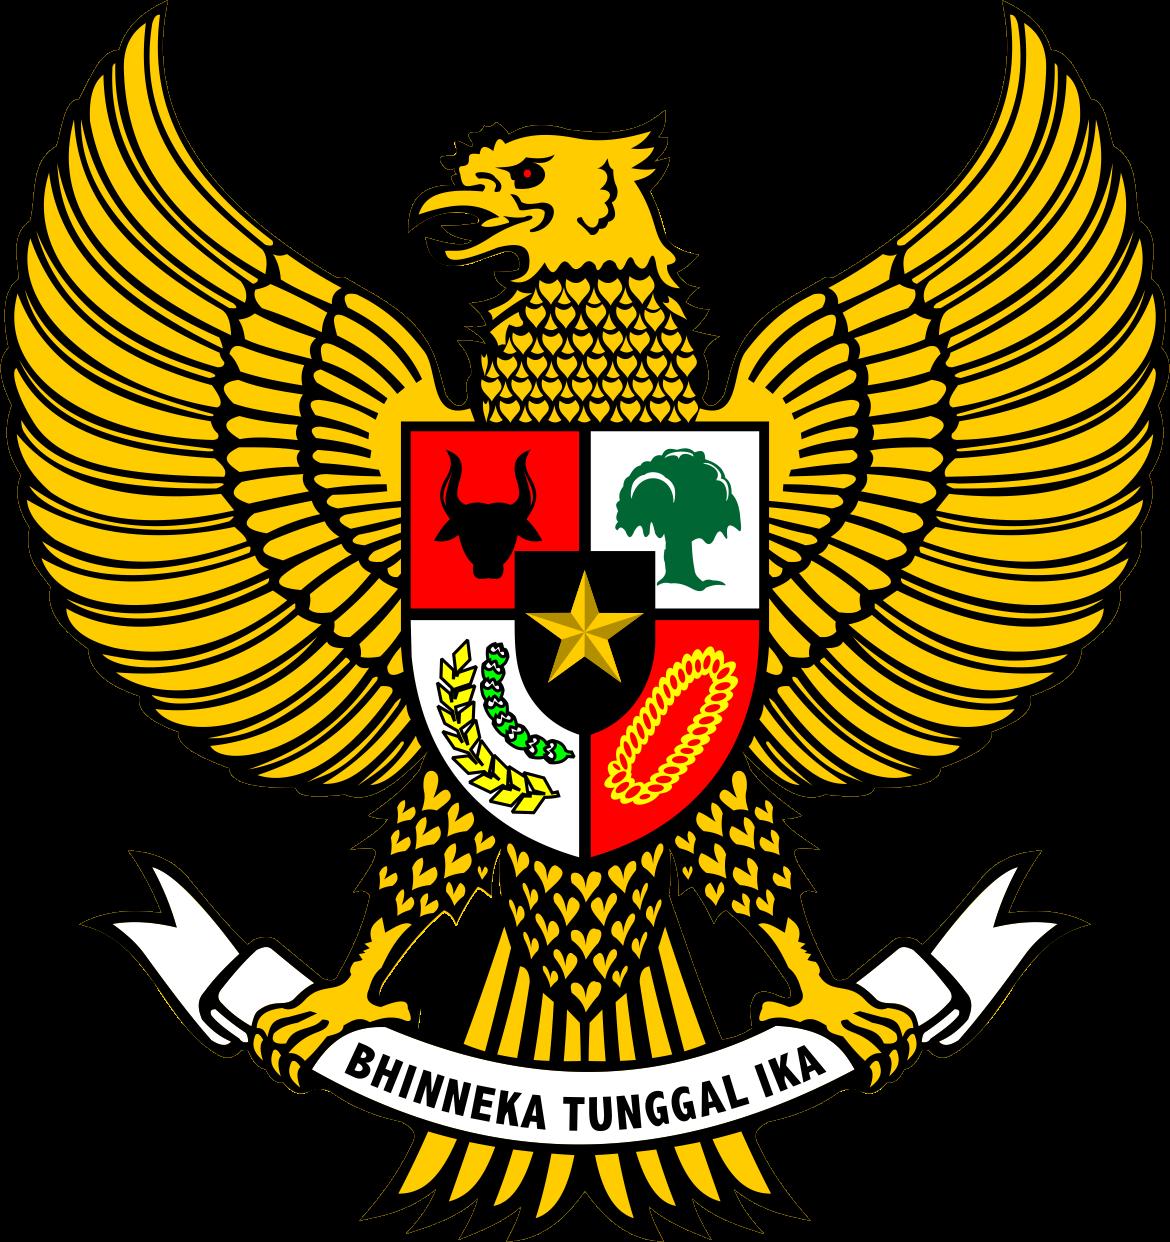 ingin menawarkan info mengenai Peraturan Menteri Pendayagunaan Aparatur Negara dan R Permenpan 22 Tahun 2018 Tentang Penerimaan Mahasiswa Sekolah Kedinasan Pada Kementerian 2018